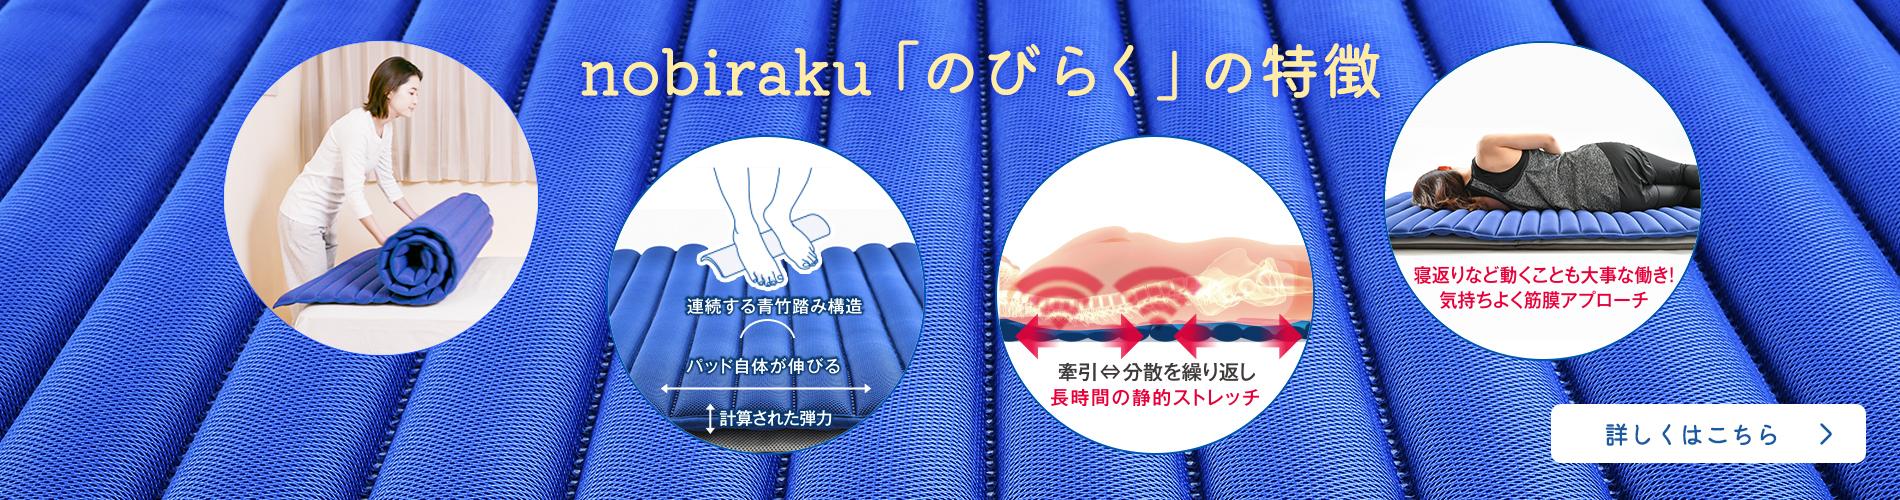 nobiraku「のびらく」の特徴